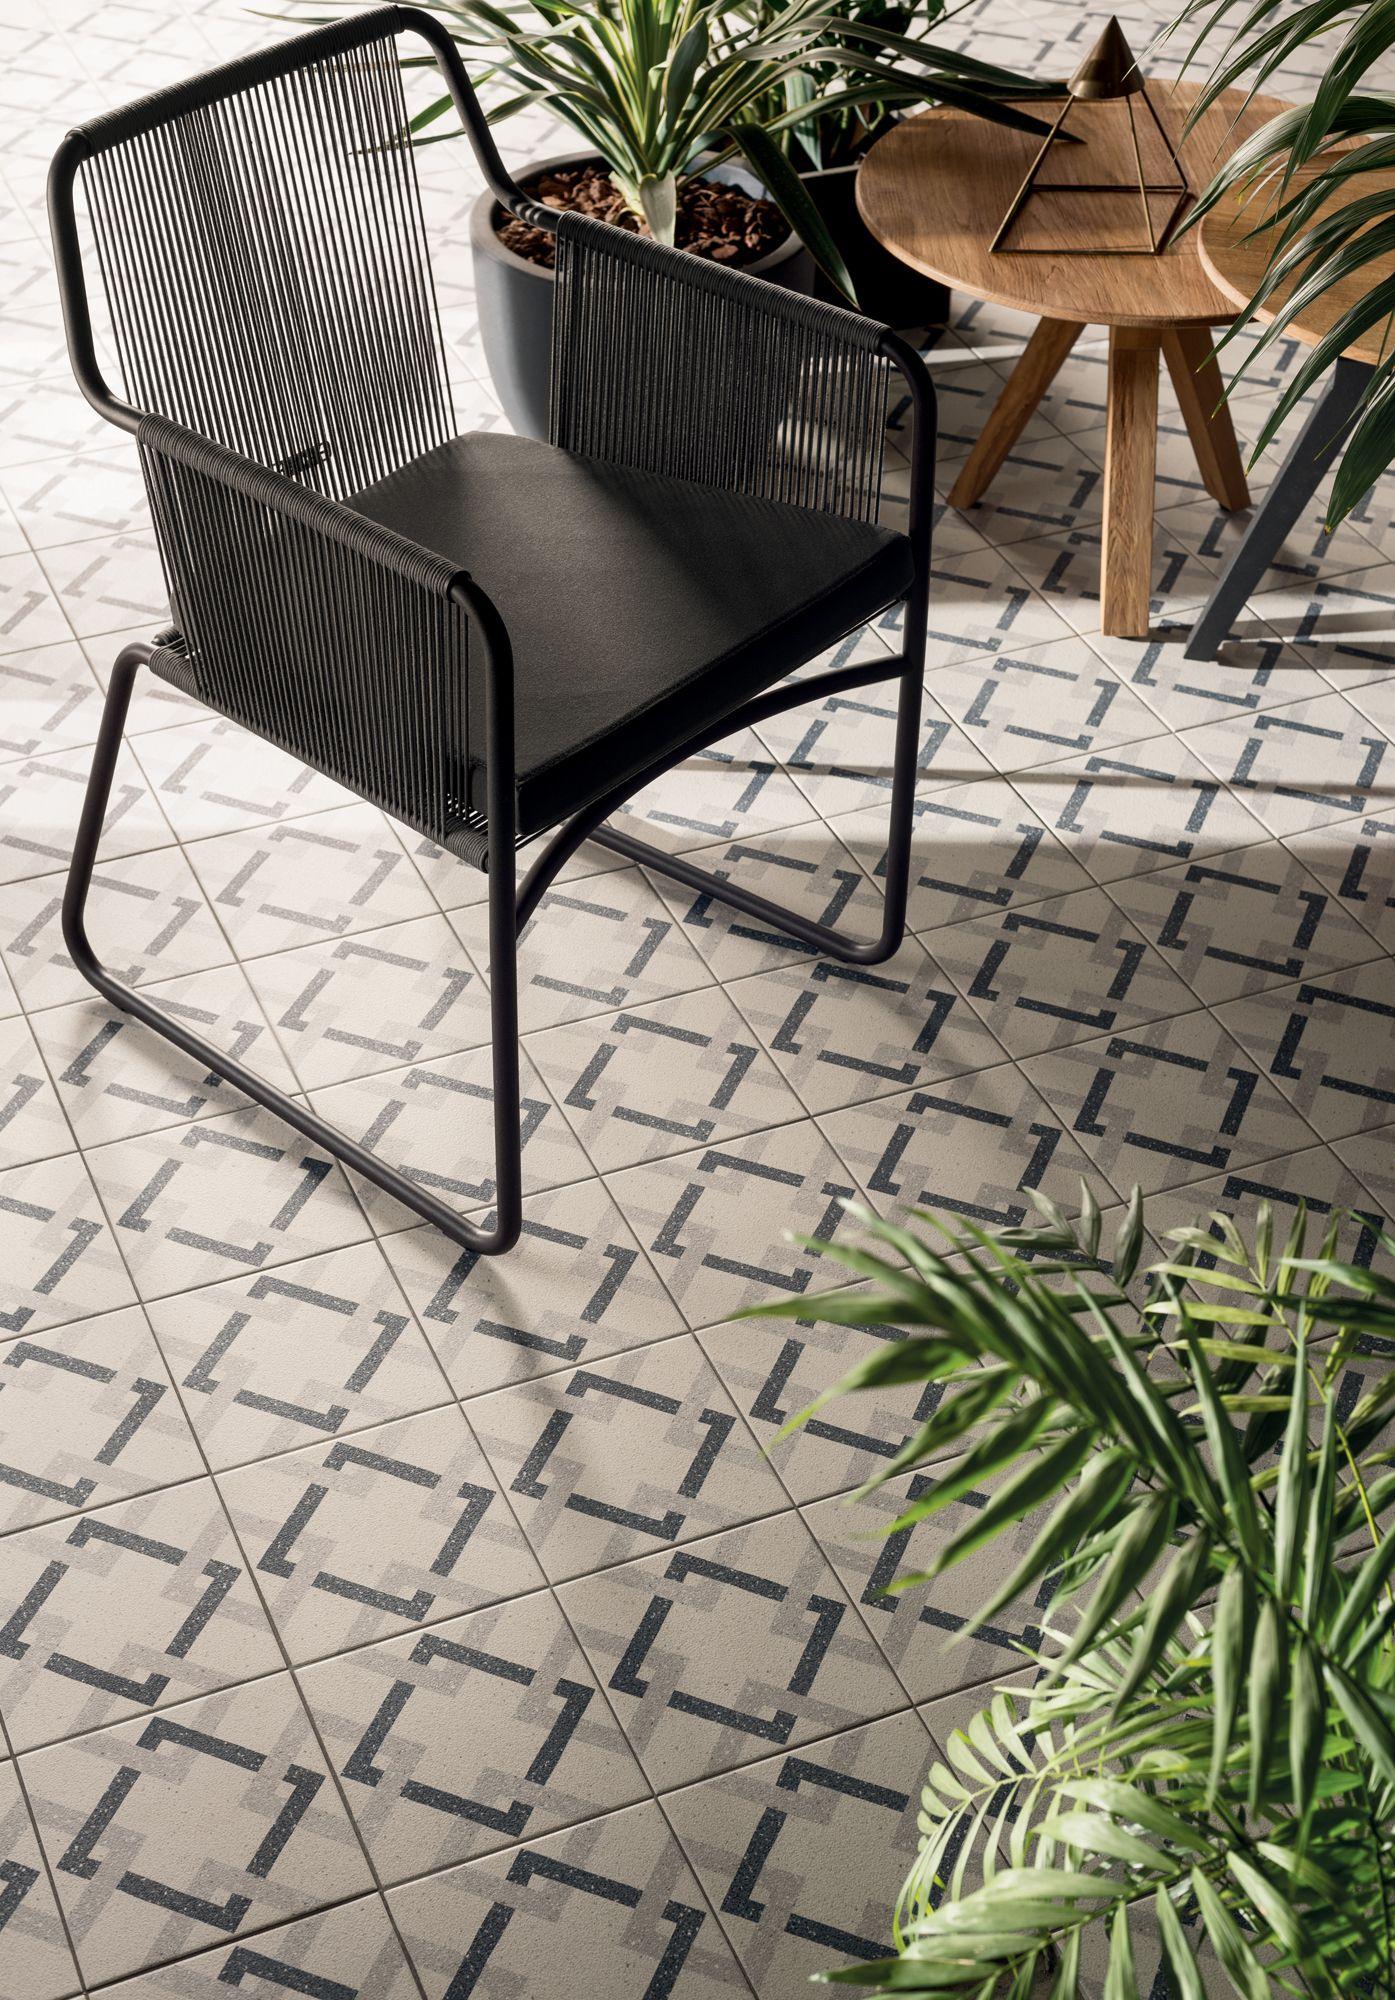 Forme Collection #terrazzo #tiles #pattern #texture http://goo.gl/yiKFFy